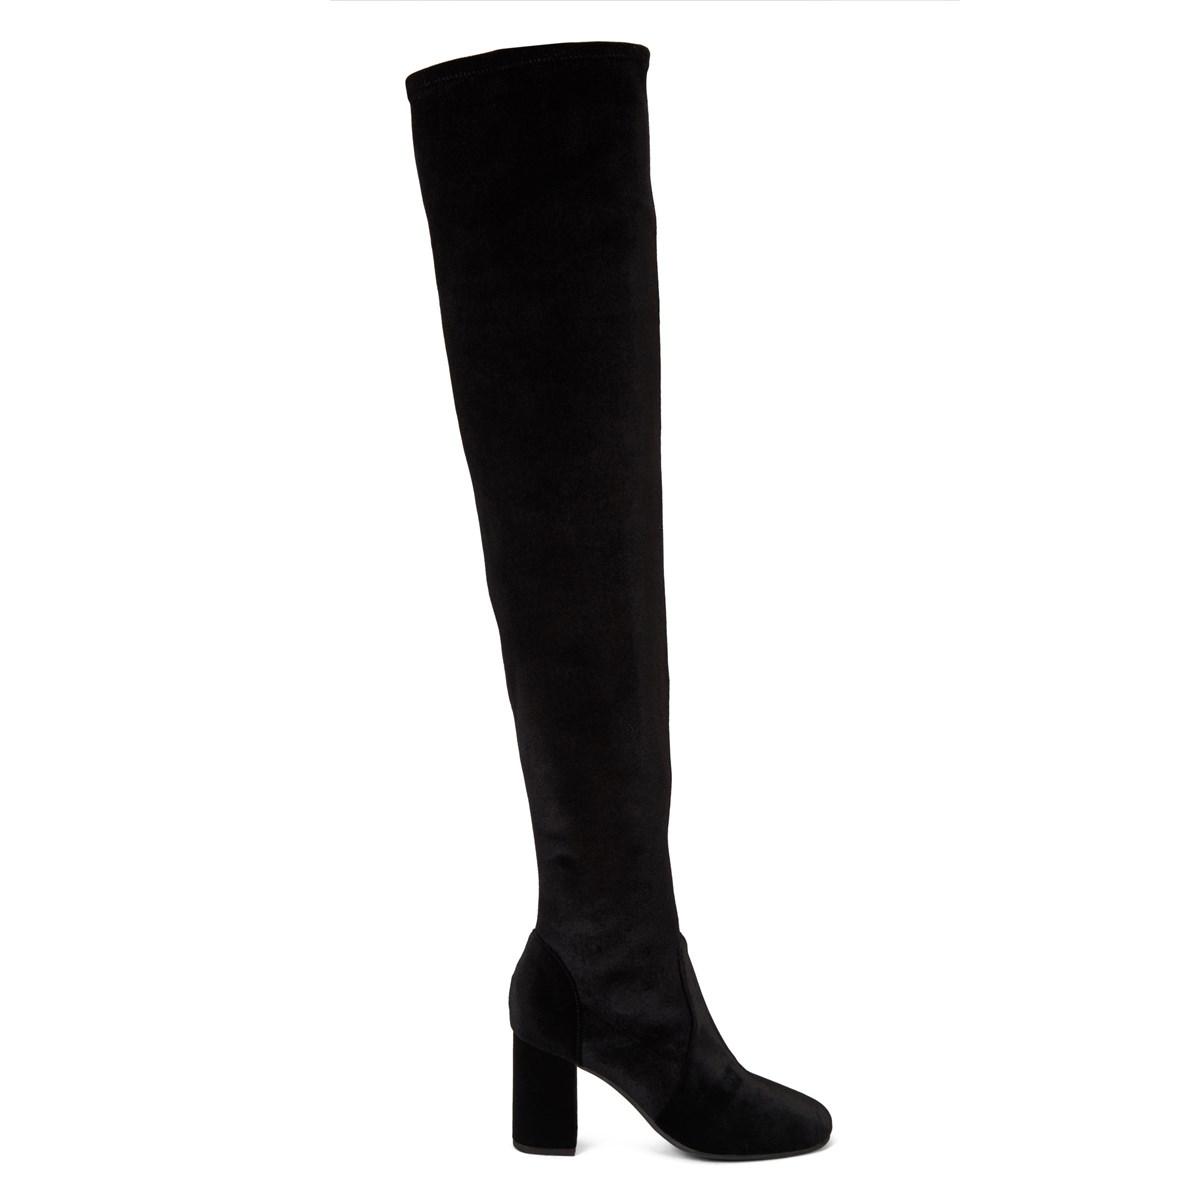 426022a23 Women's Amber Black Velvet Thigh High Boot